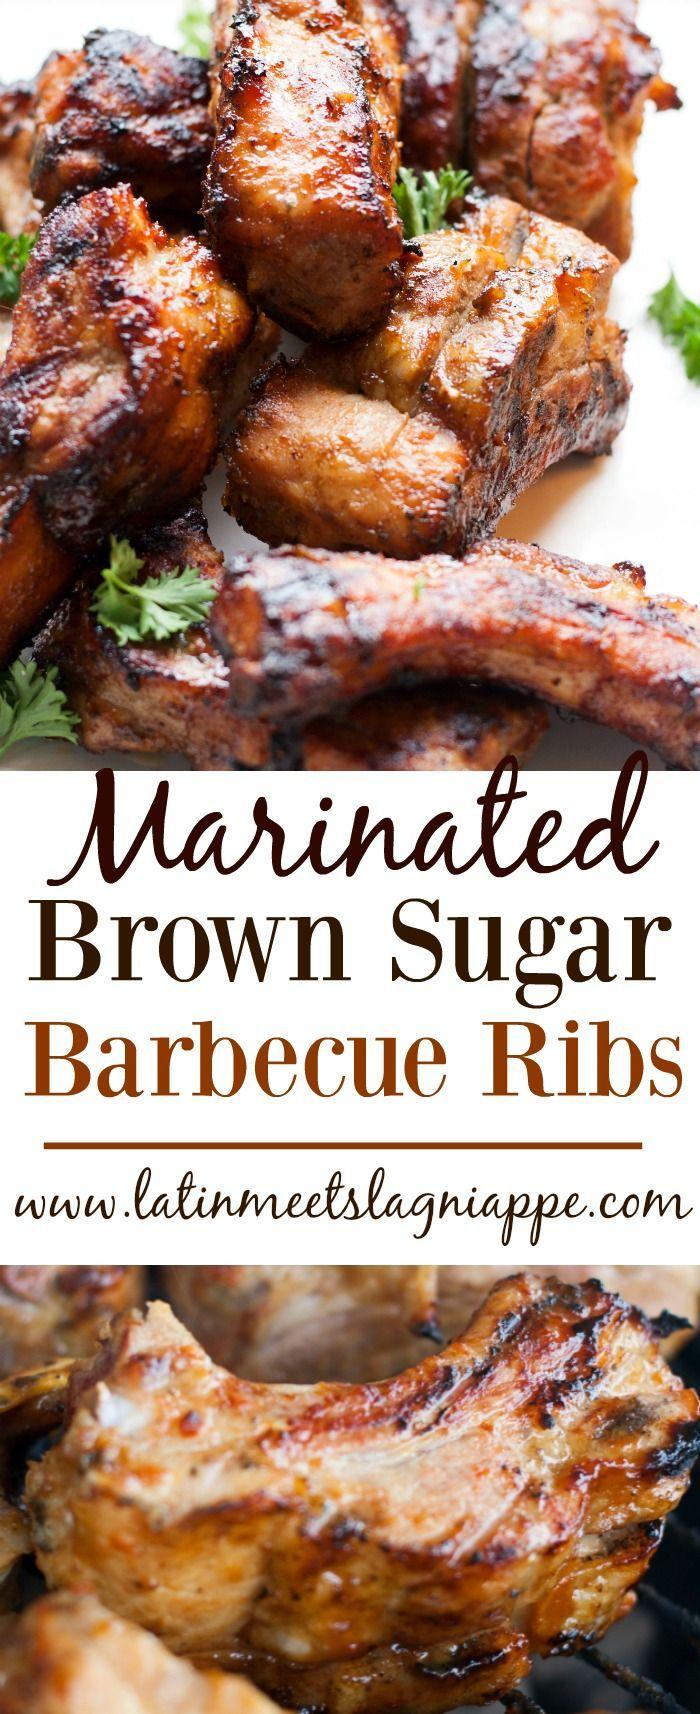 Marinated  Brown Sugar Barbecue Ribs - such a delicious way to enjoy ribs! #Ad #HogWildThrowdown